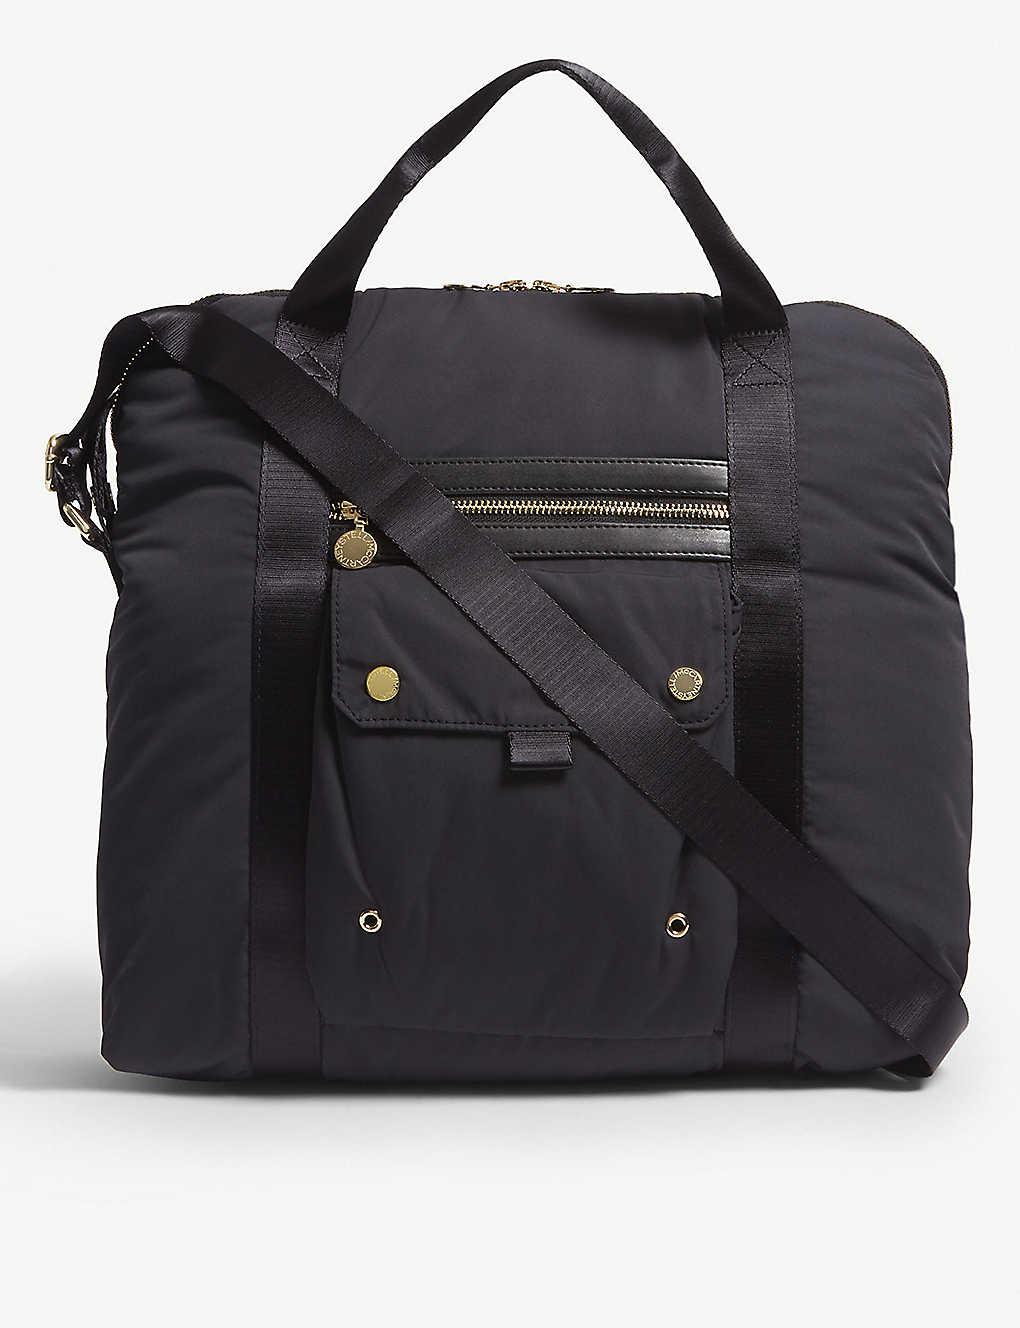 a46c7a68de95 STELLA MCCARTNEY - Fern changing bag | Selfridges.com